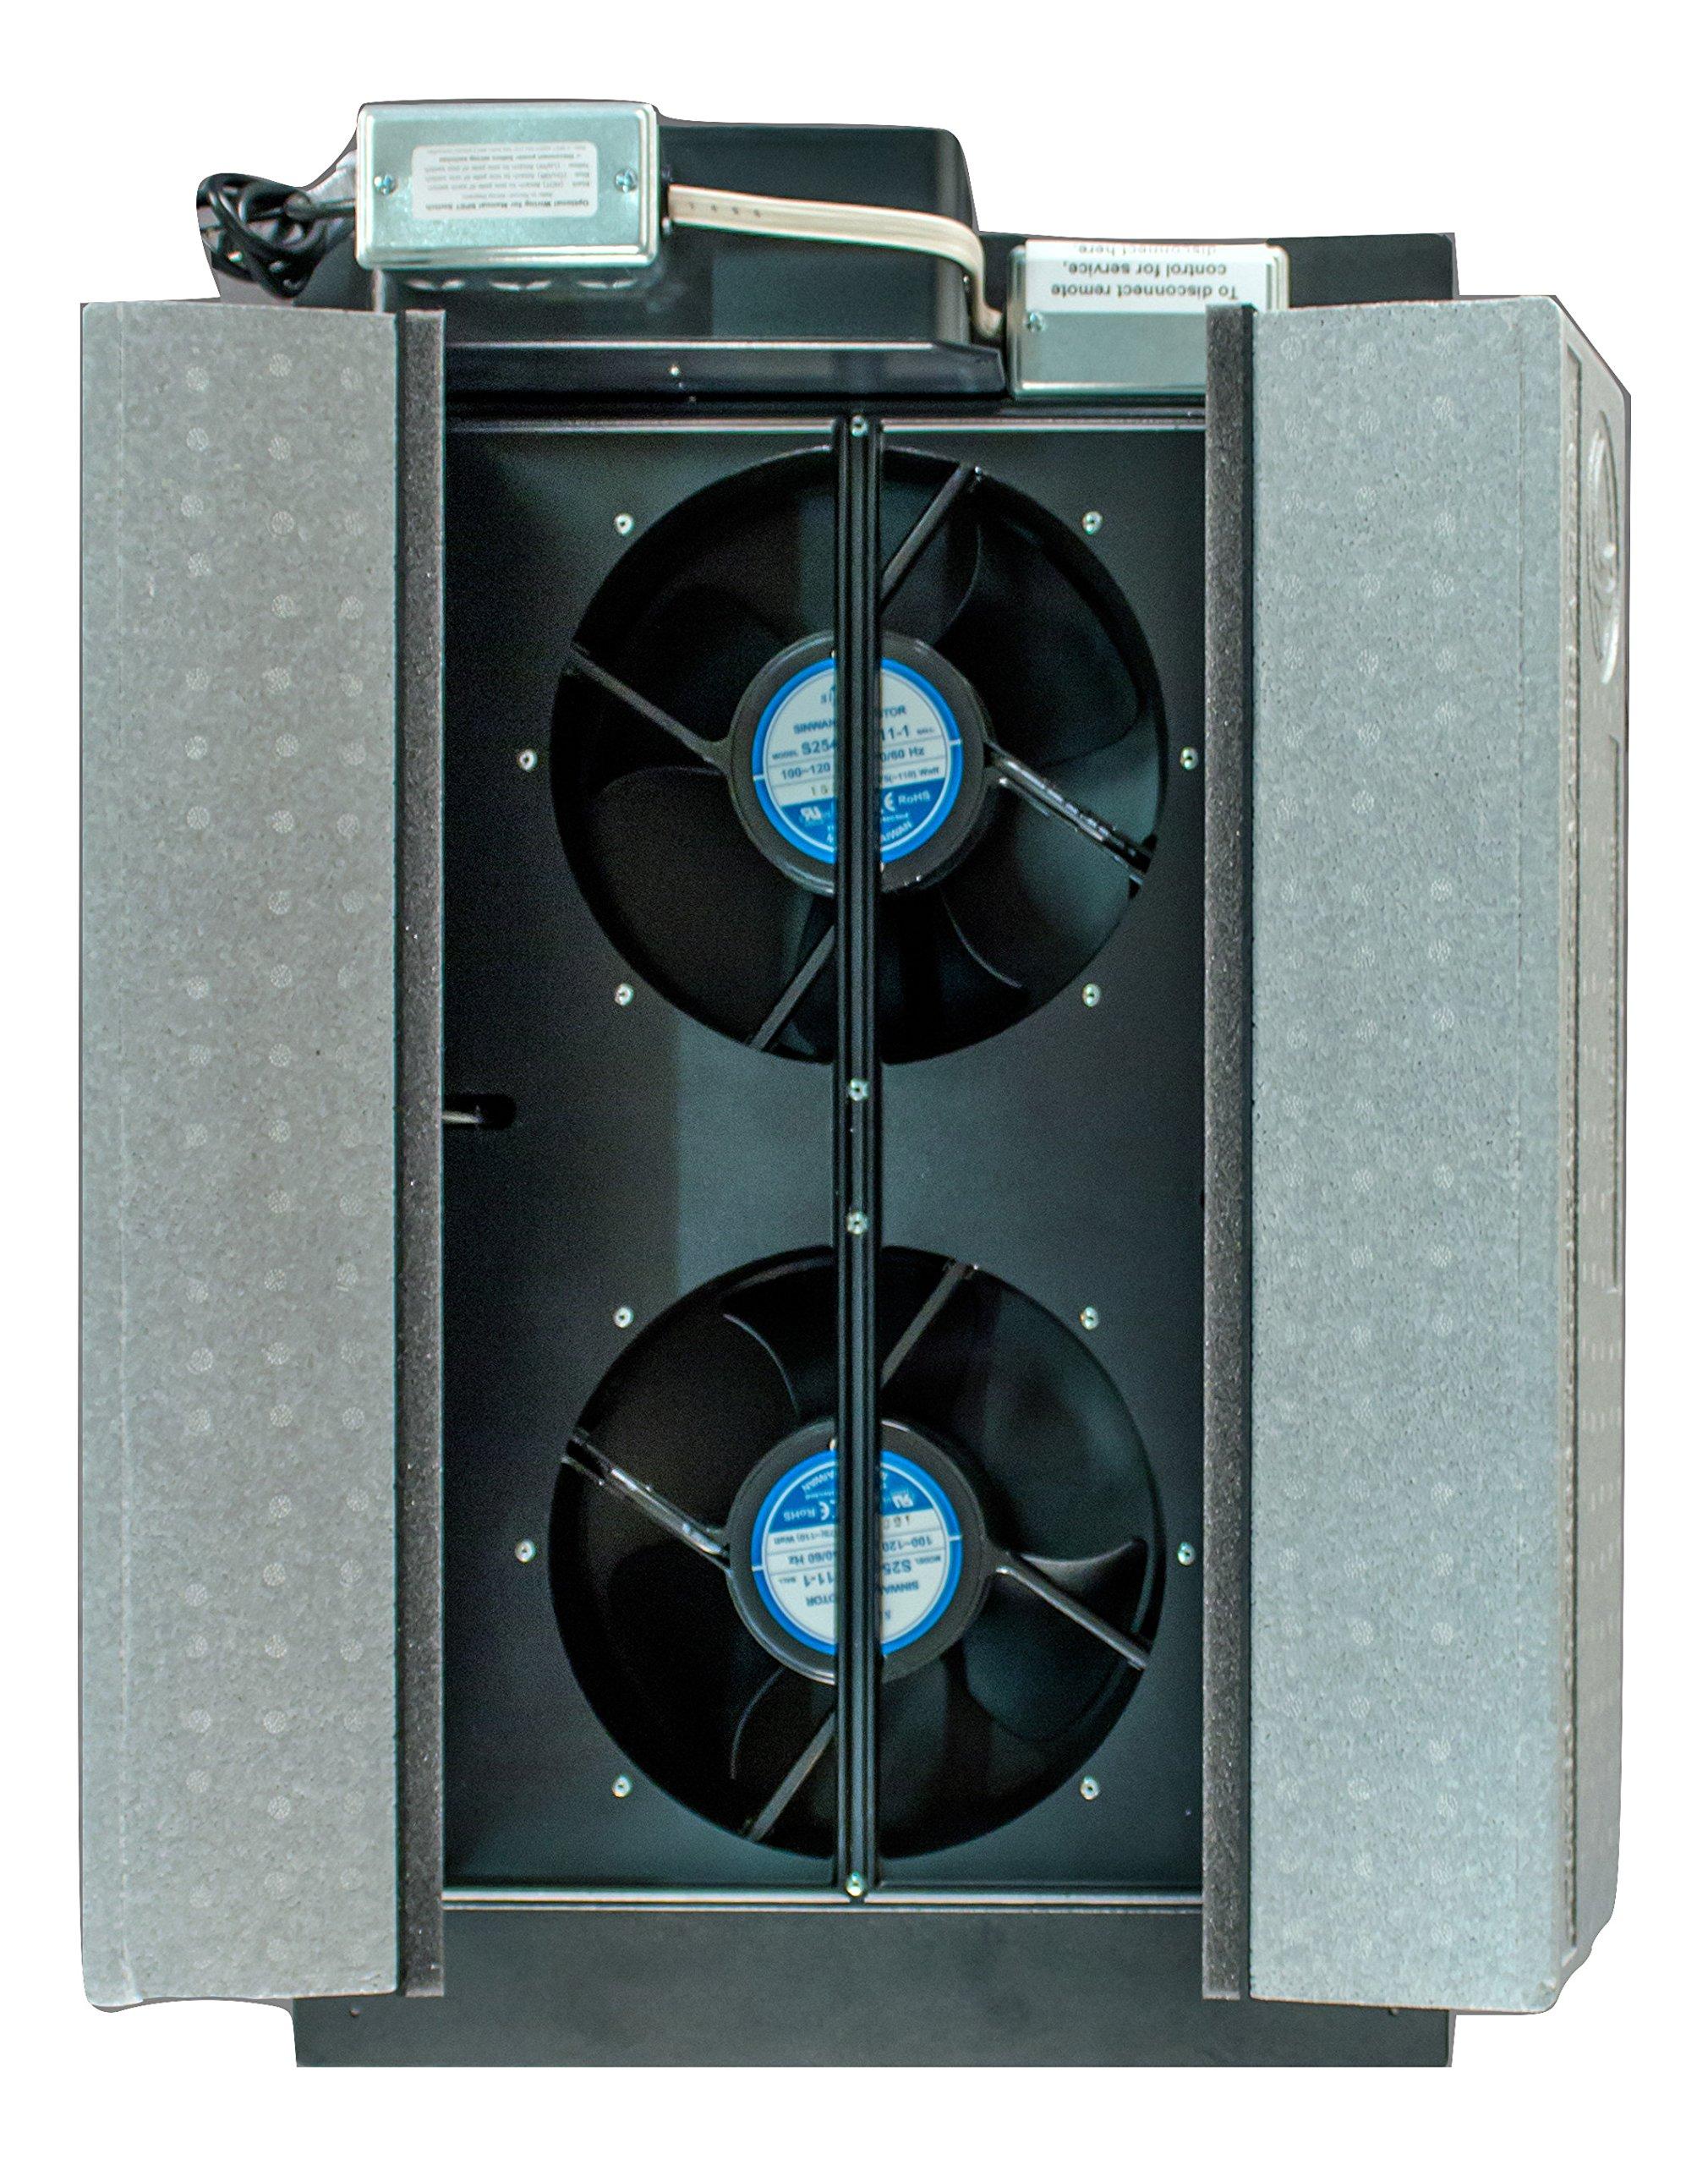 HV1600 Whole House Fan R38 Insulation